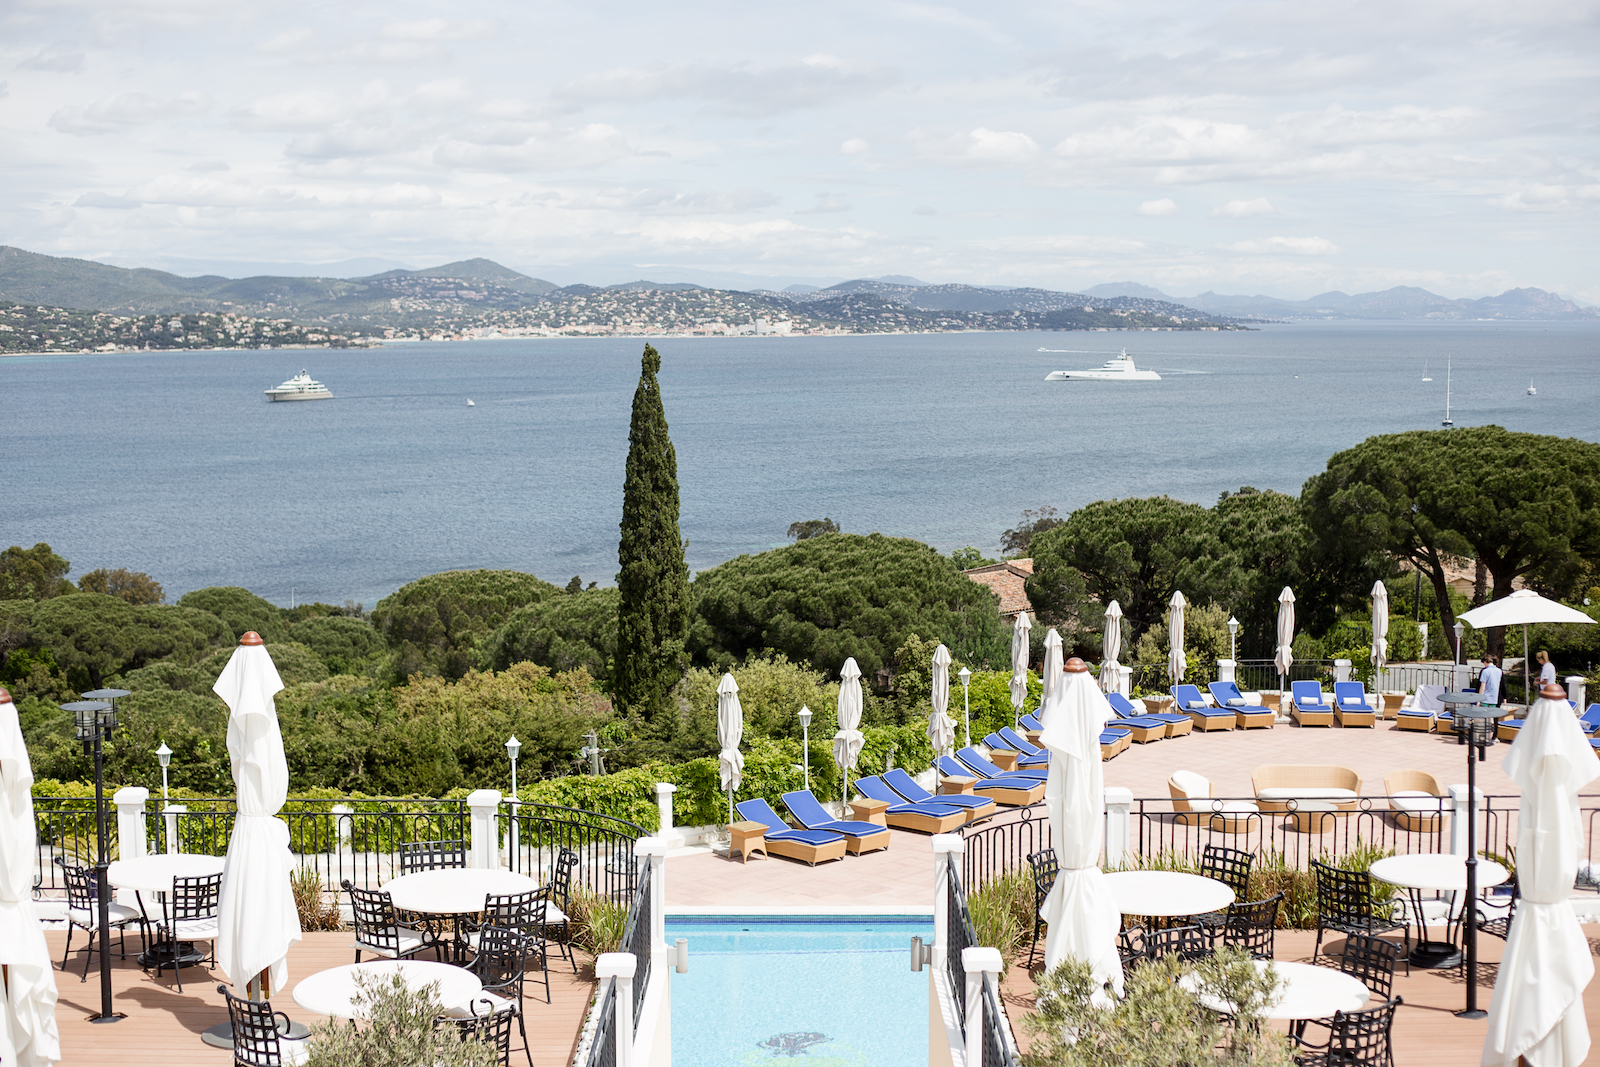 villa-belrose-althoff-hotel-st-tropez-livia-auer-IMG_6230